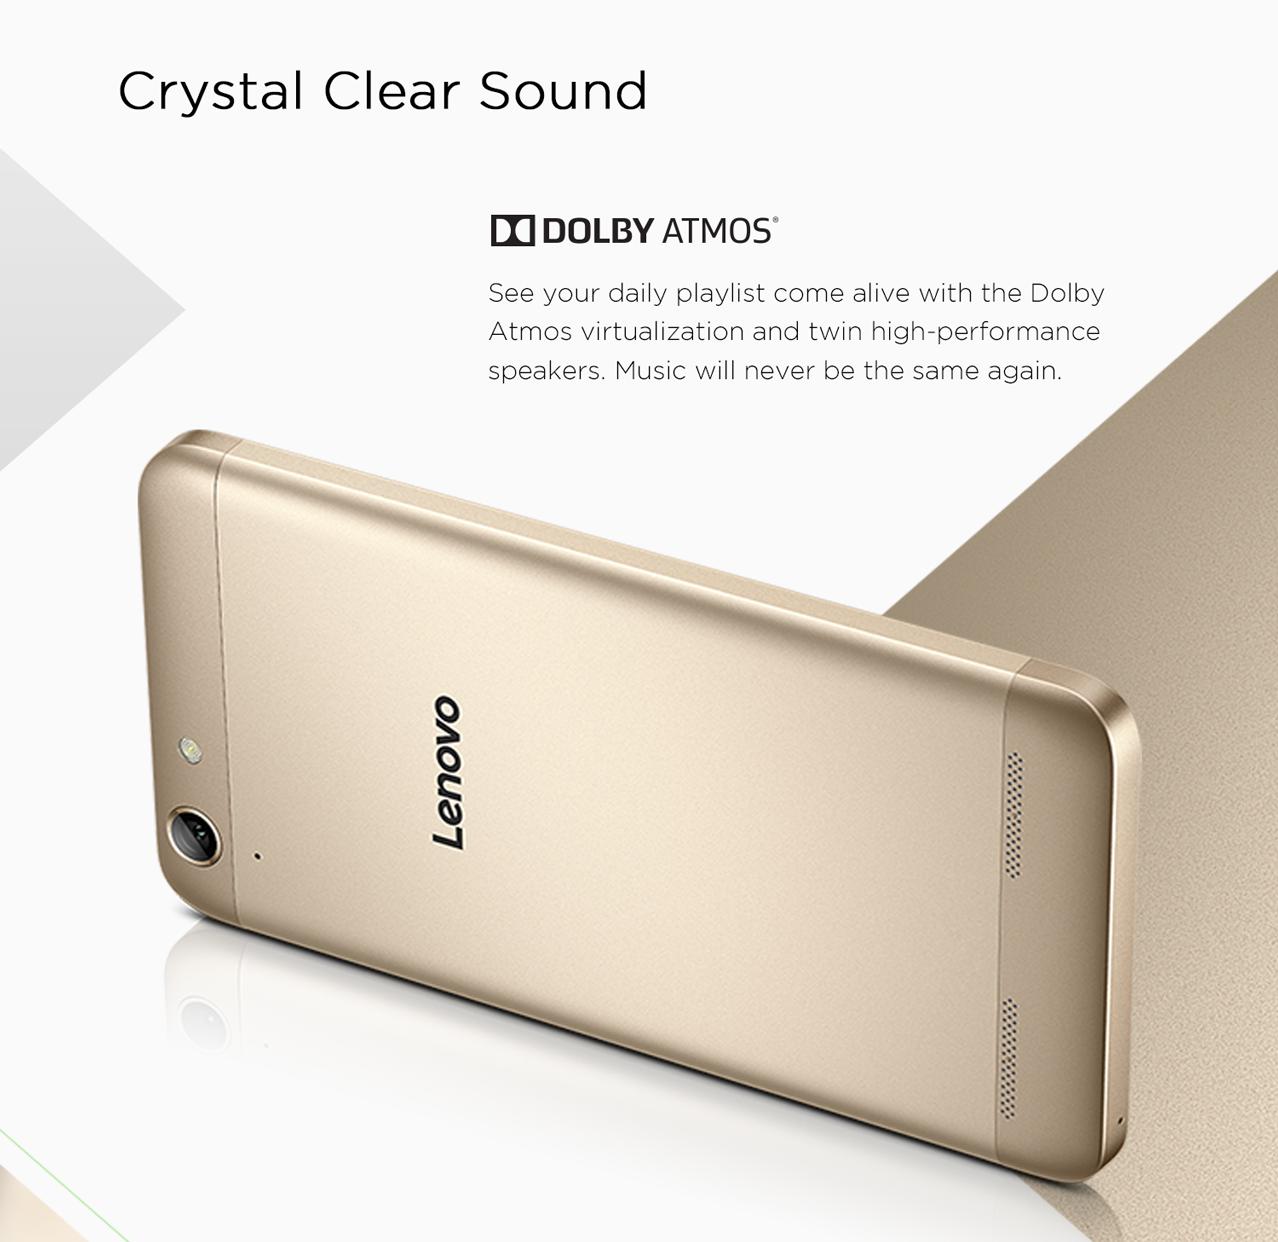 Crystal Clear Sound